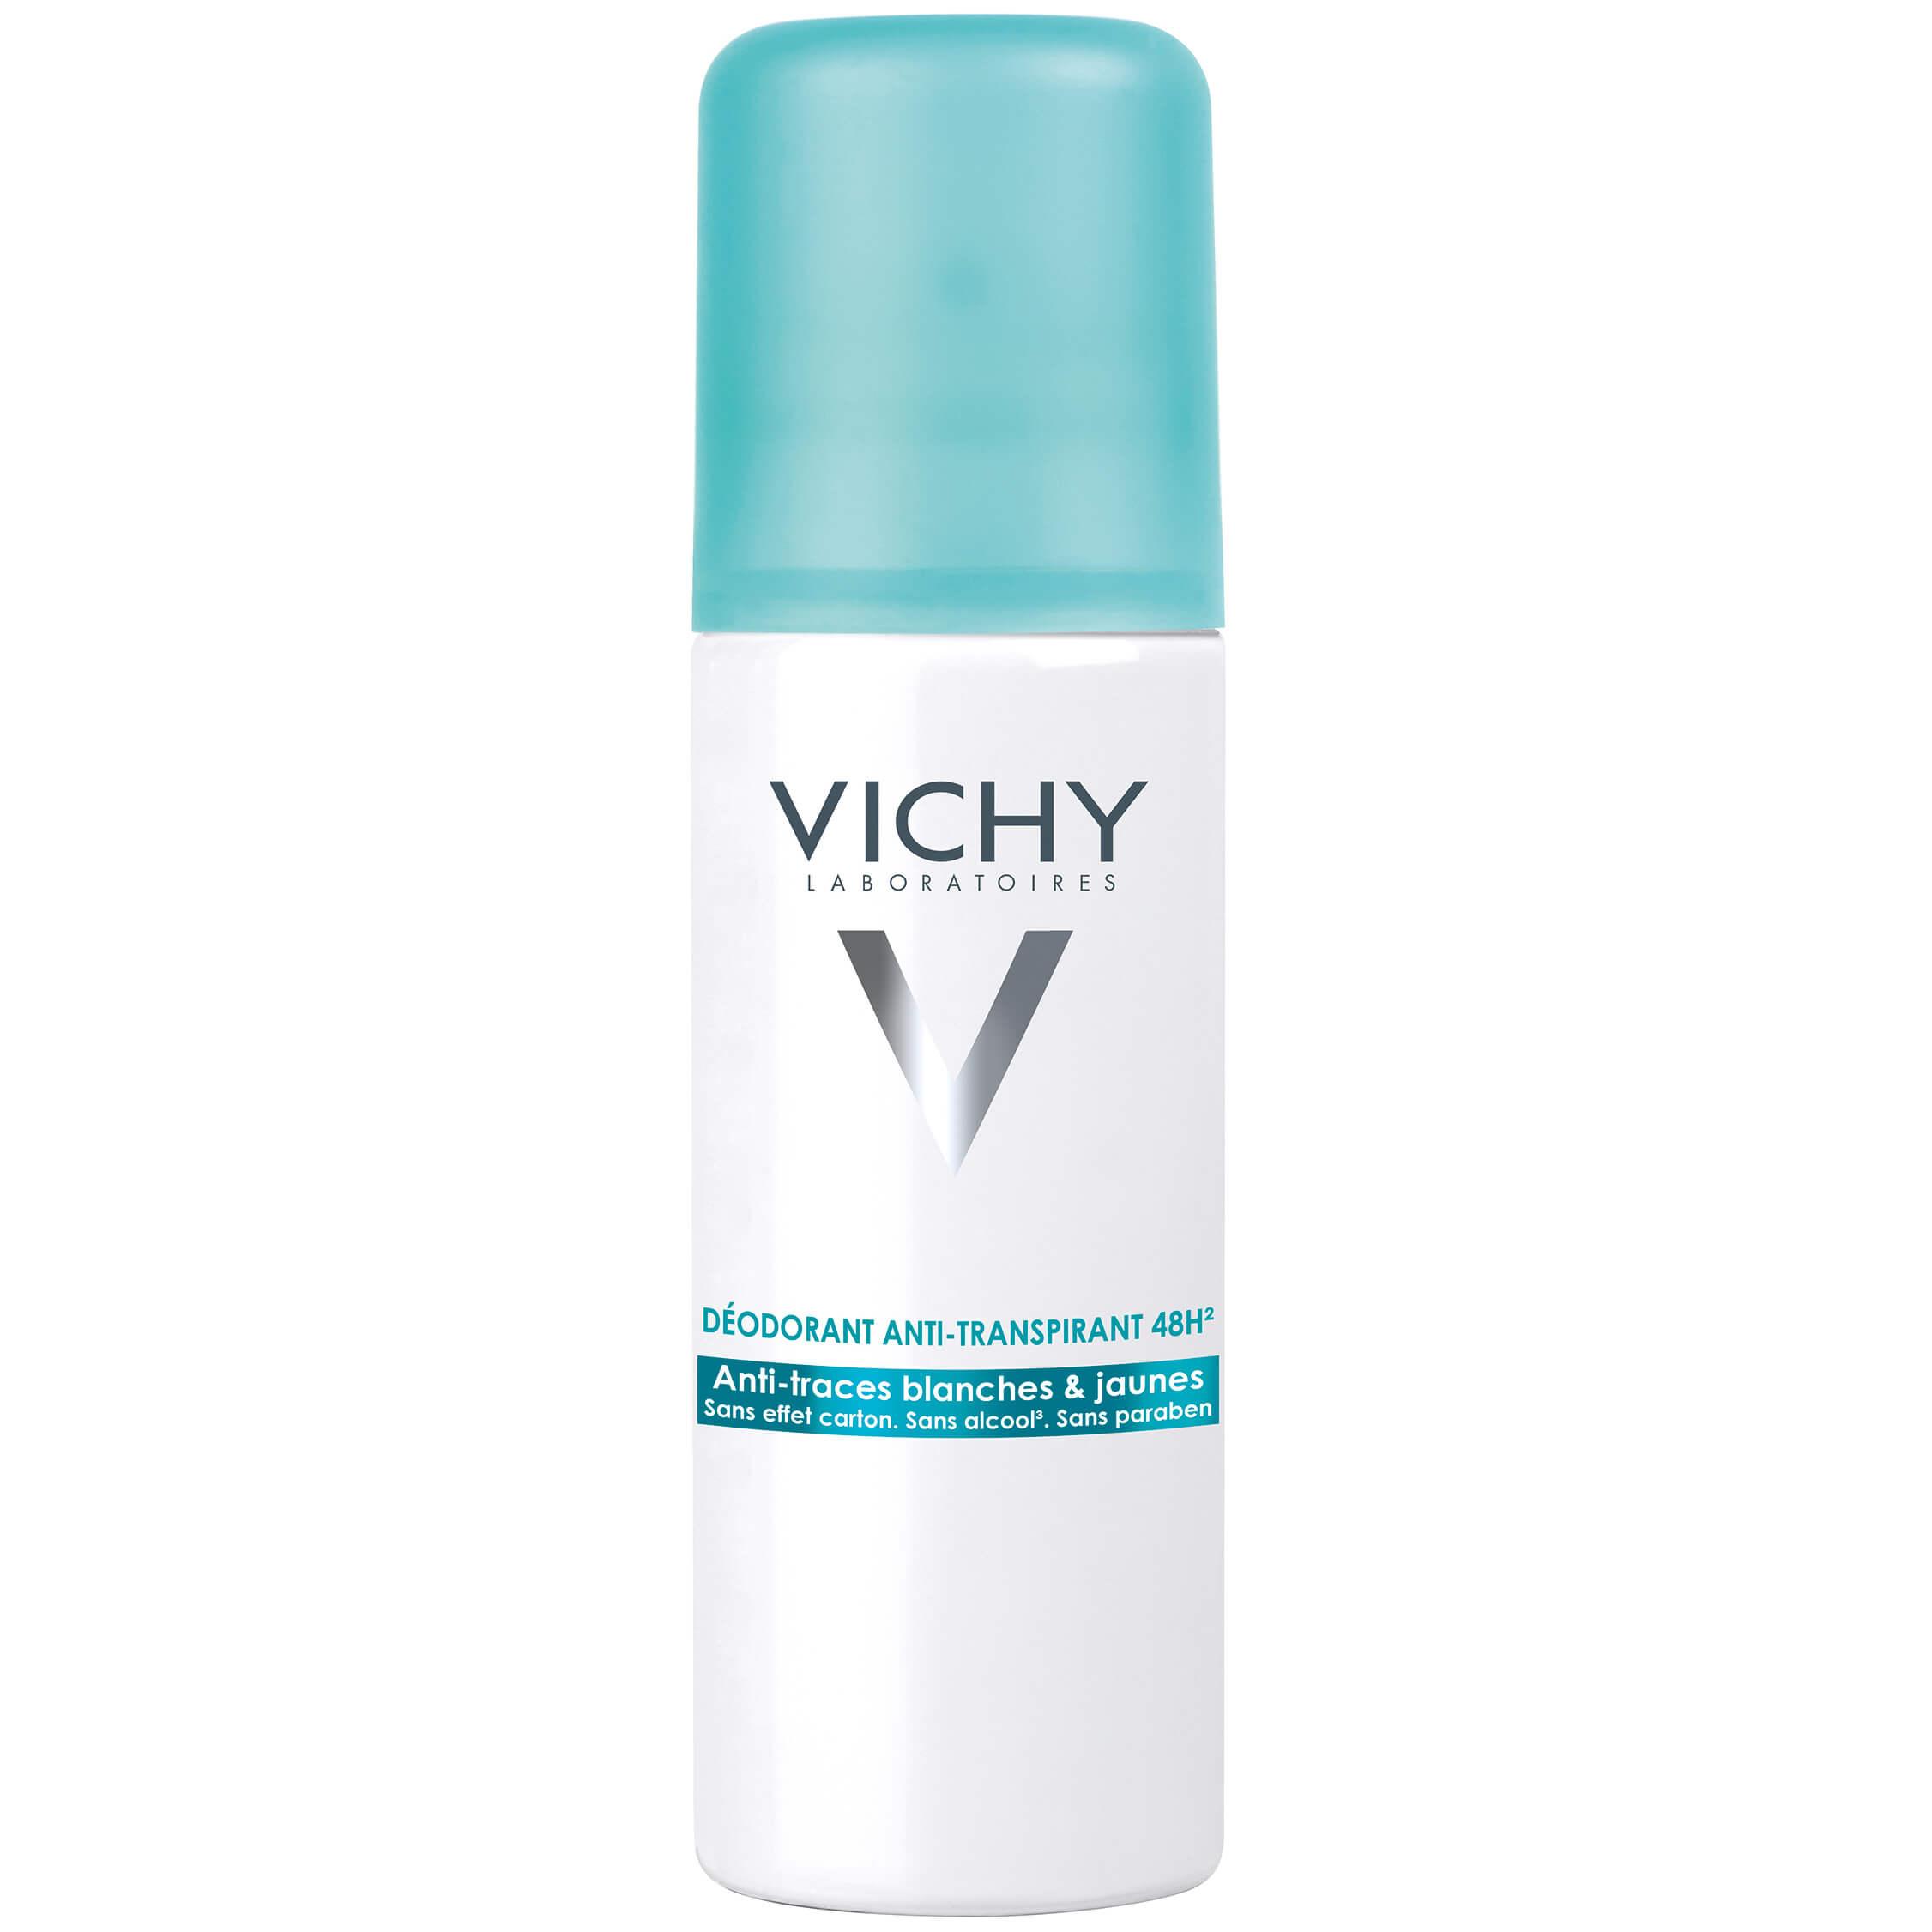 Vichy Deodorant 48h Αποσμητική Φροντίδα Κατά της Έντονης Εφίδρωσης, Χαρίζει Αίσθηση Φρεσκάδας 125ml